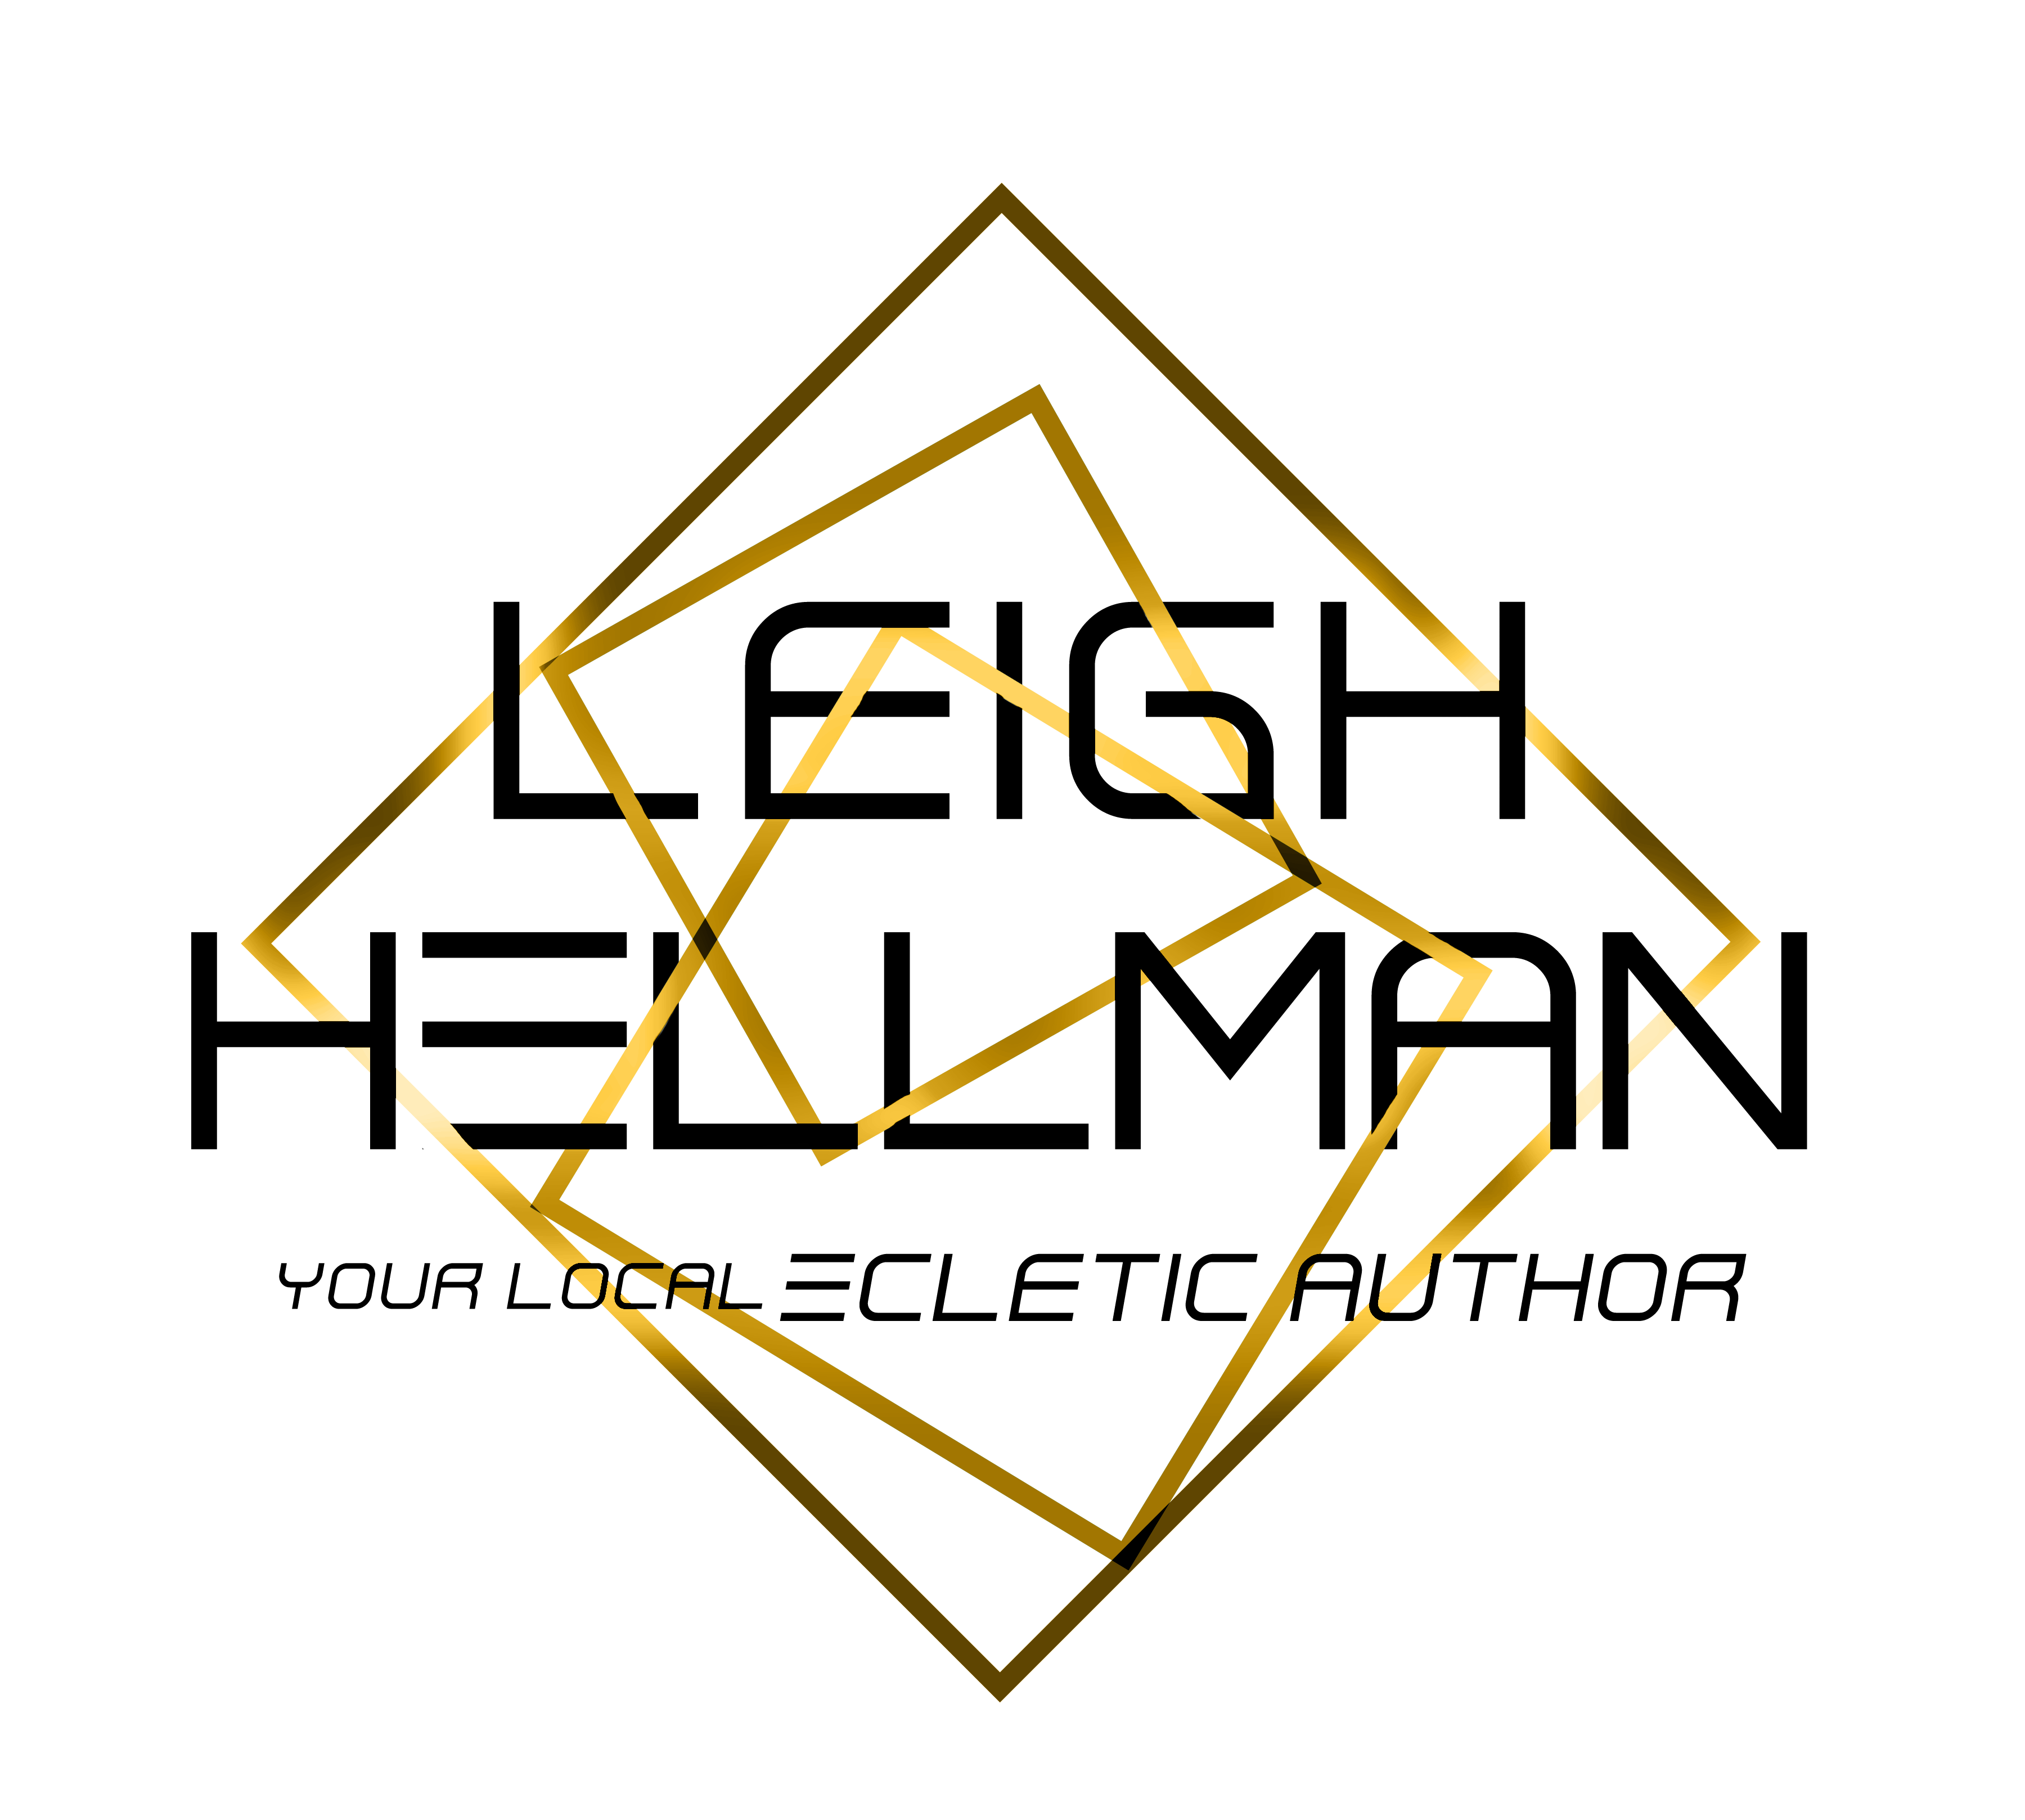 Leigh Hellman